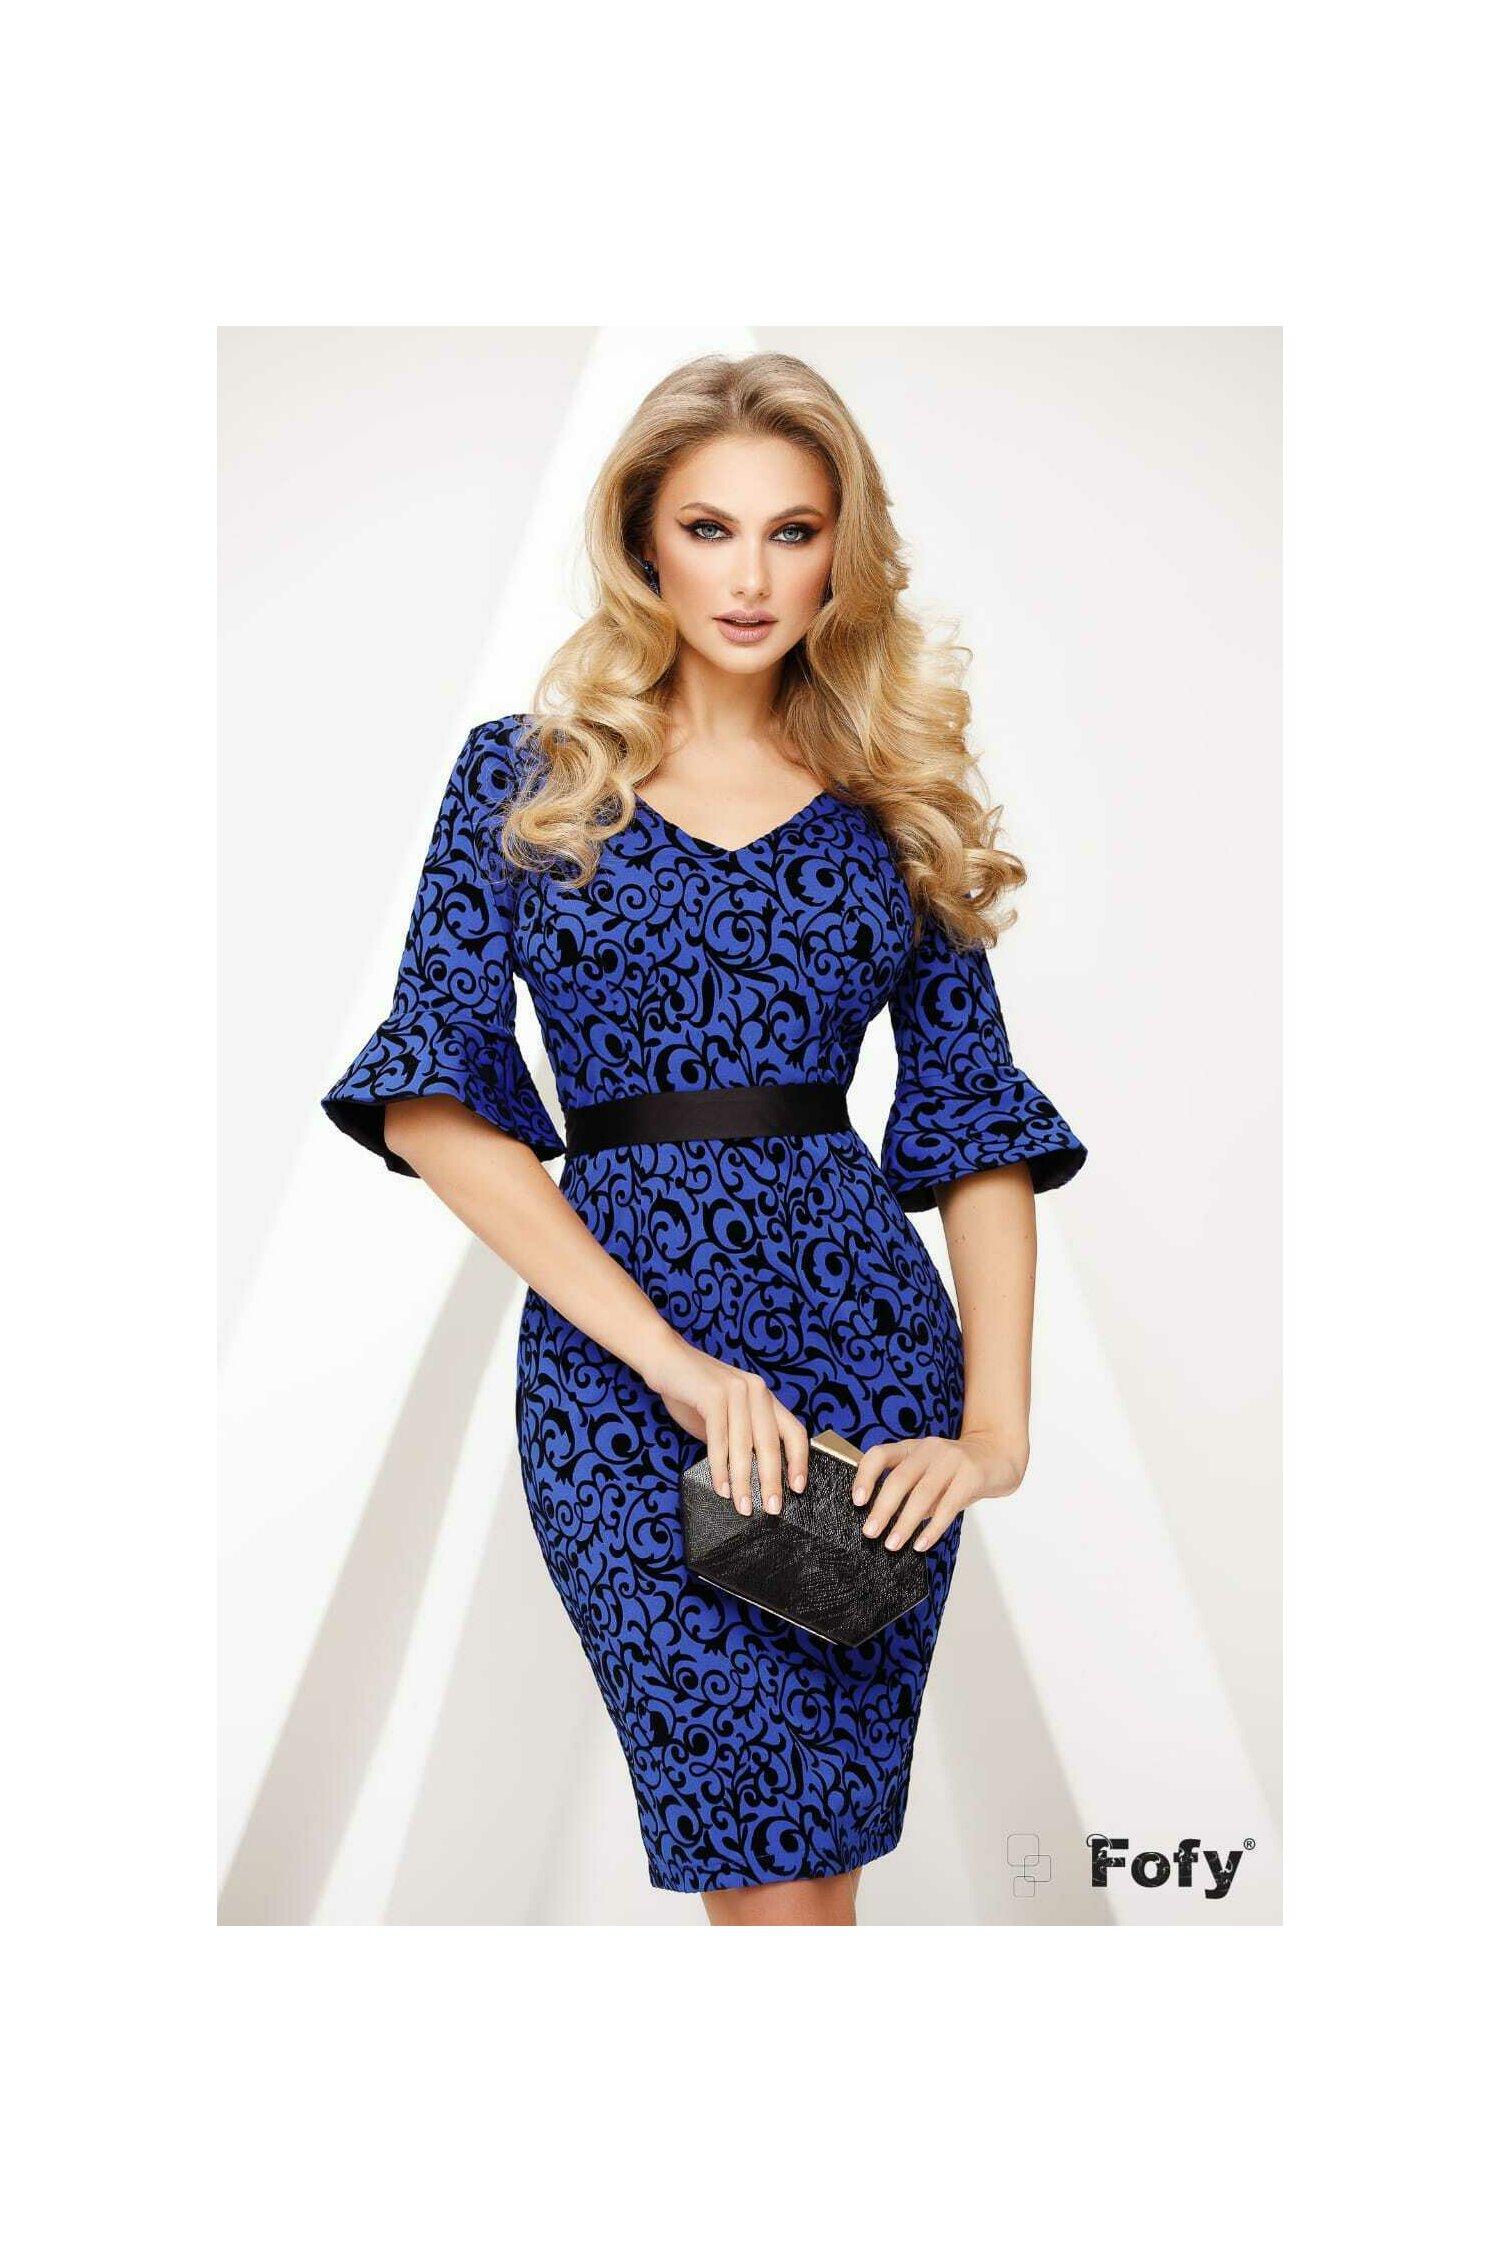 Rochie Fofy dama albastru royal conica cu imprimeu catifelat arabesque imagine